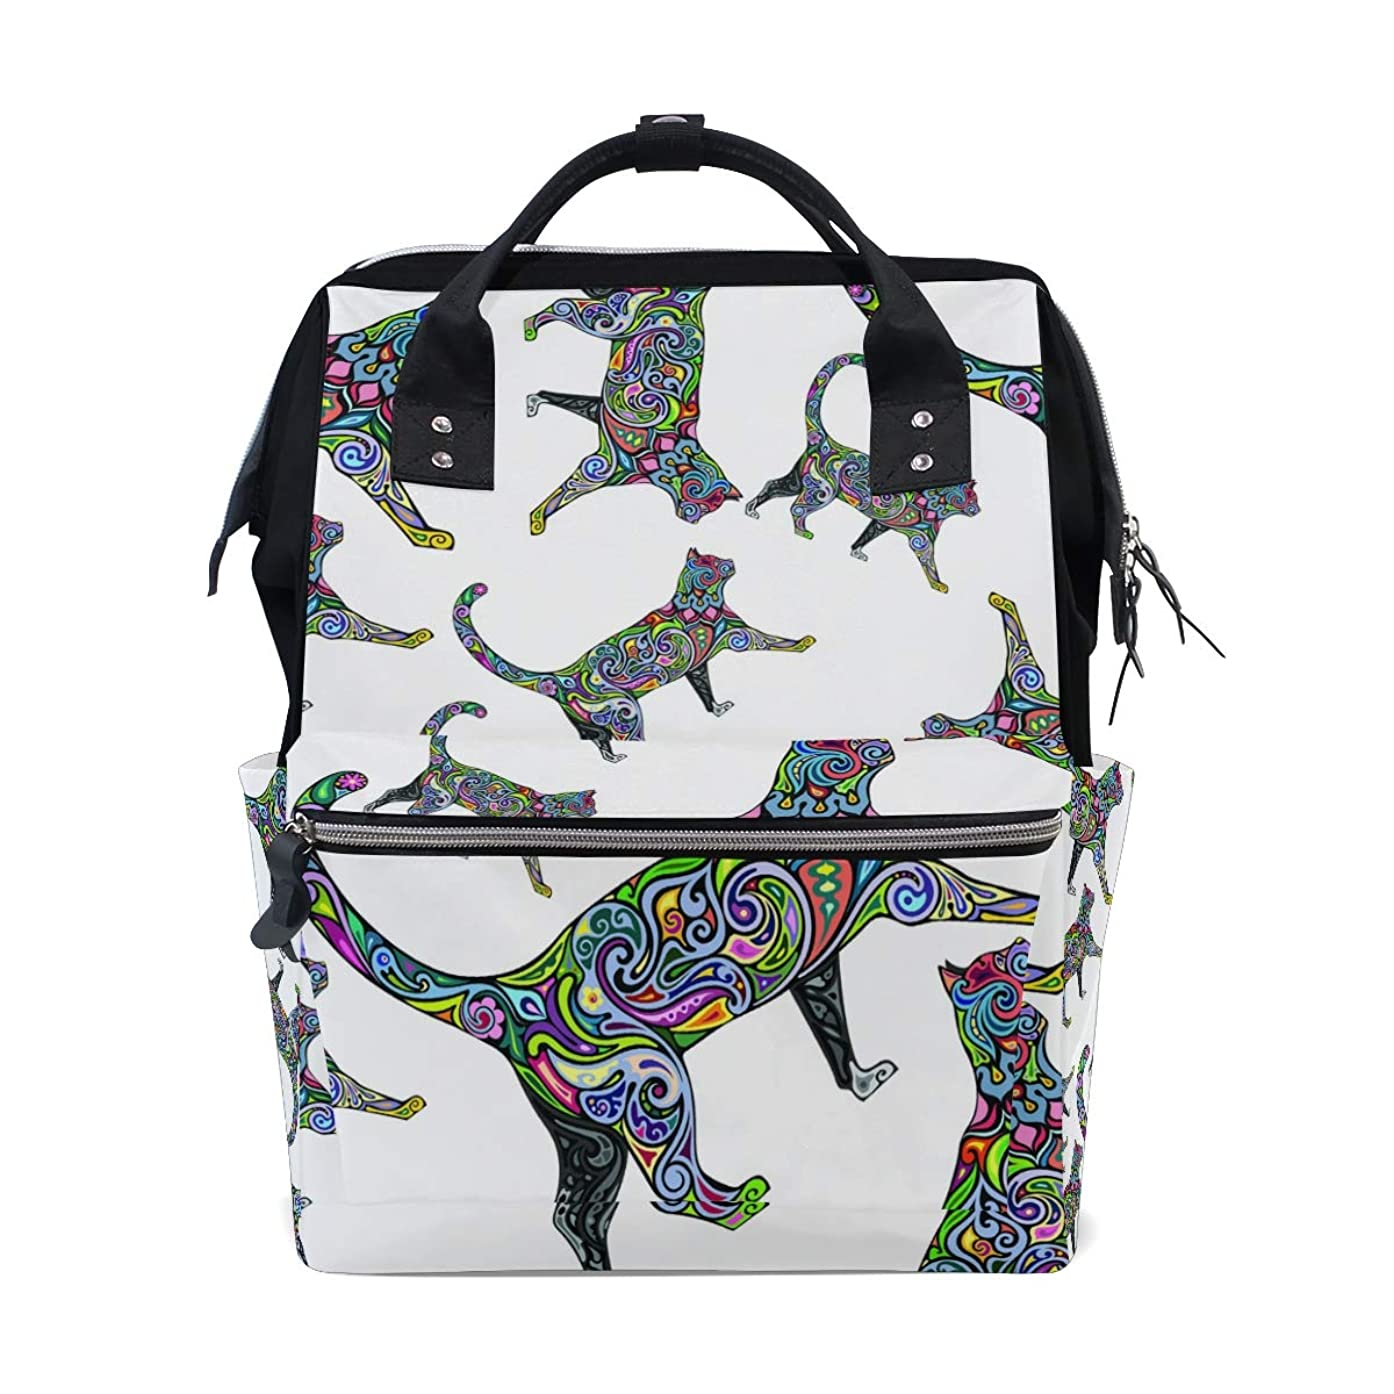 Backpack Art Psychedelic Cat School Rucksack Diaper Bags Travel Shoulder Large Capacity Bookbag for Women Men